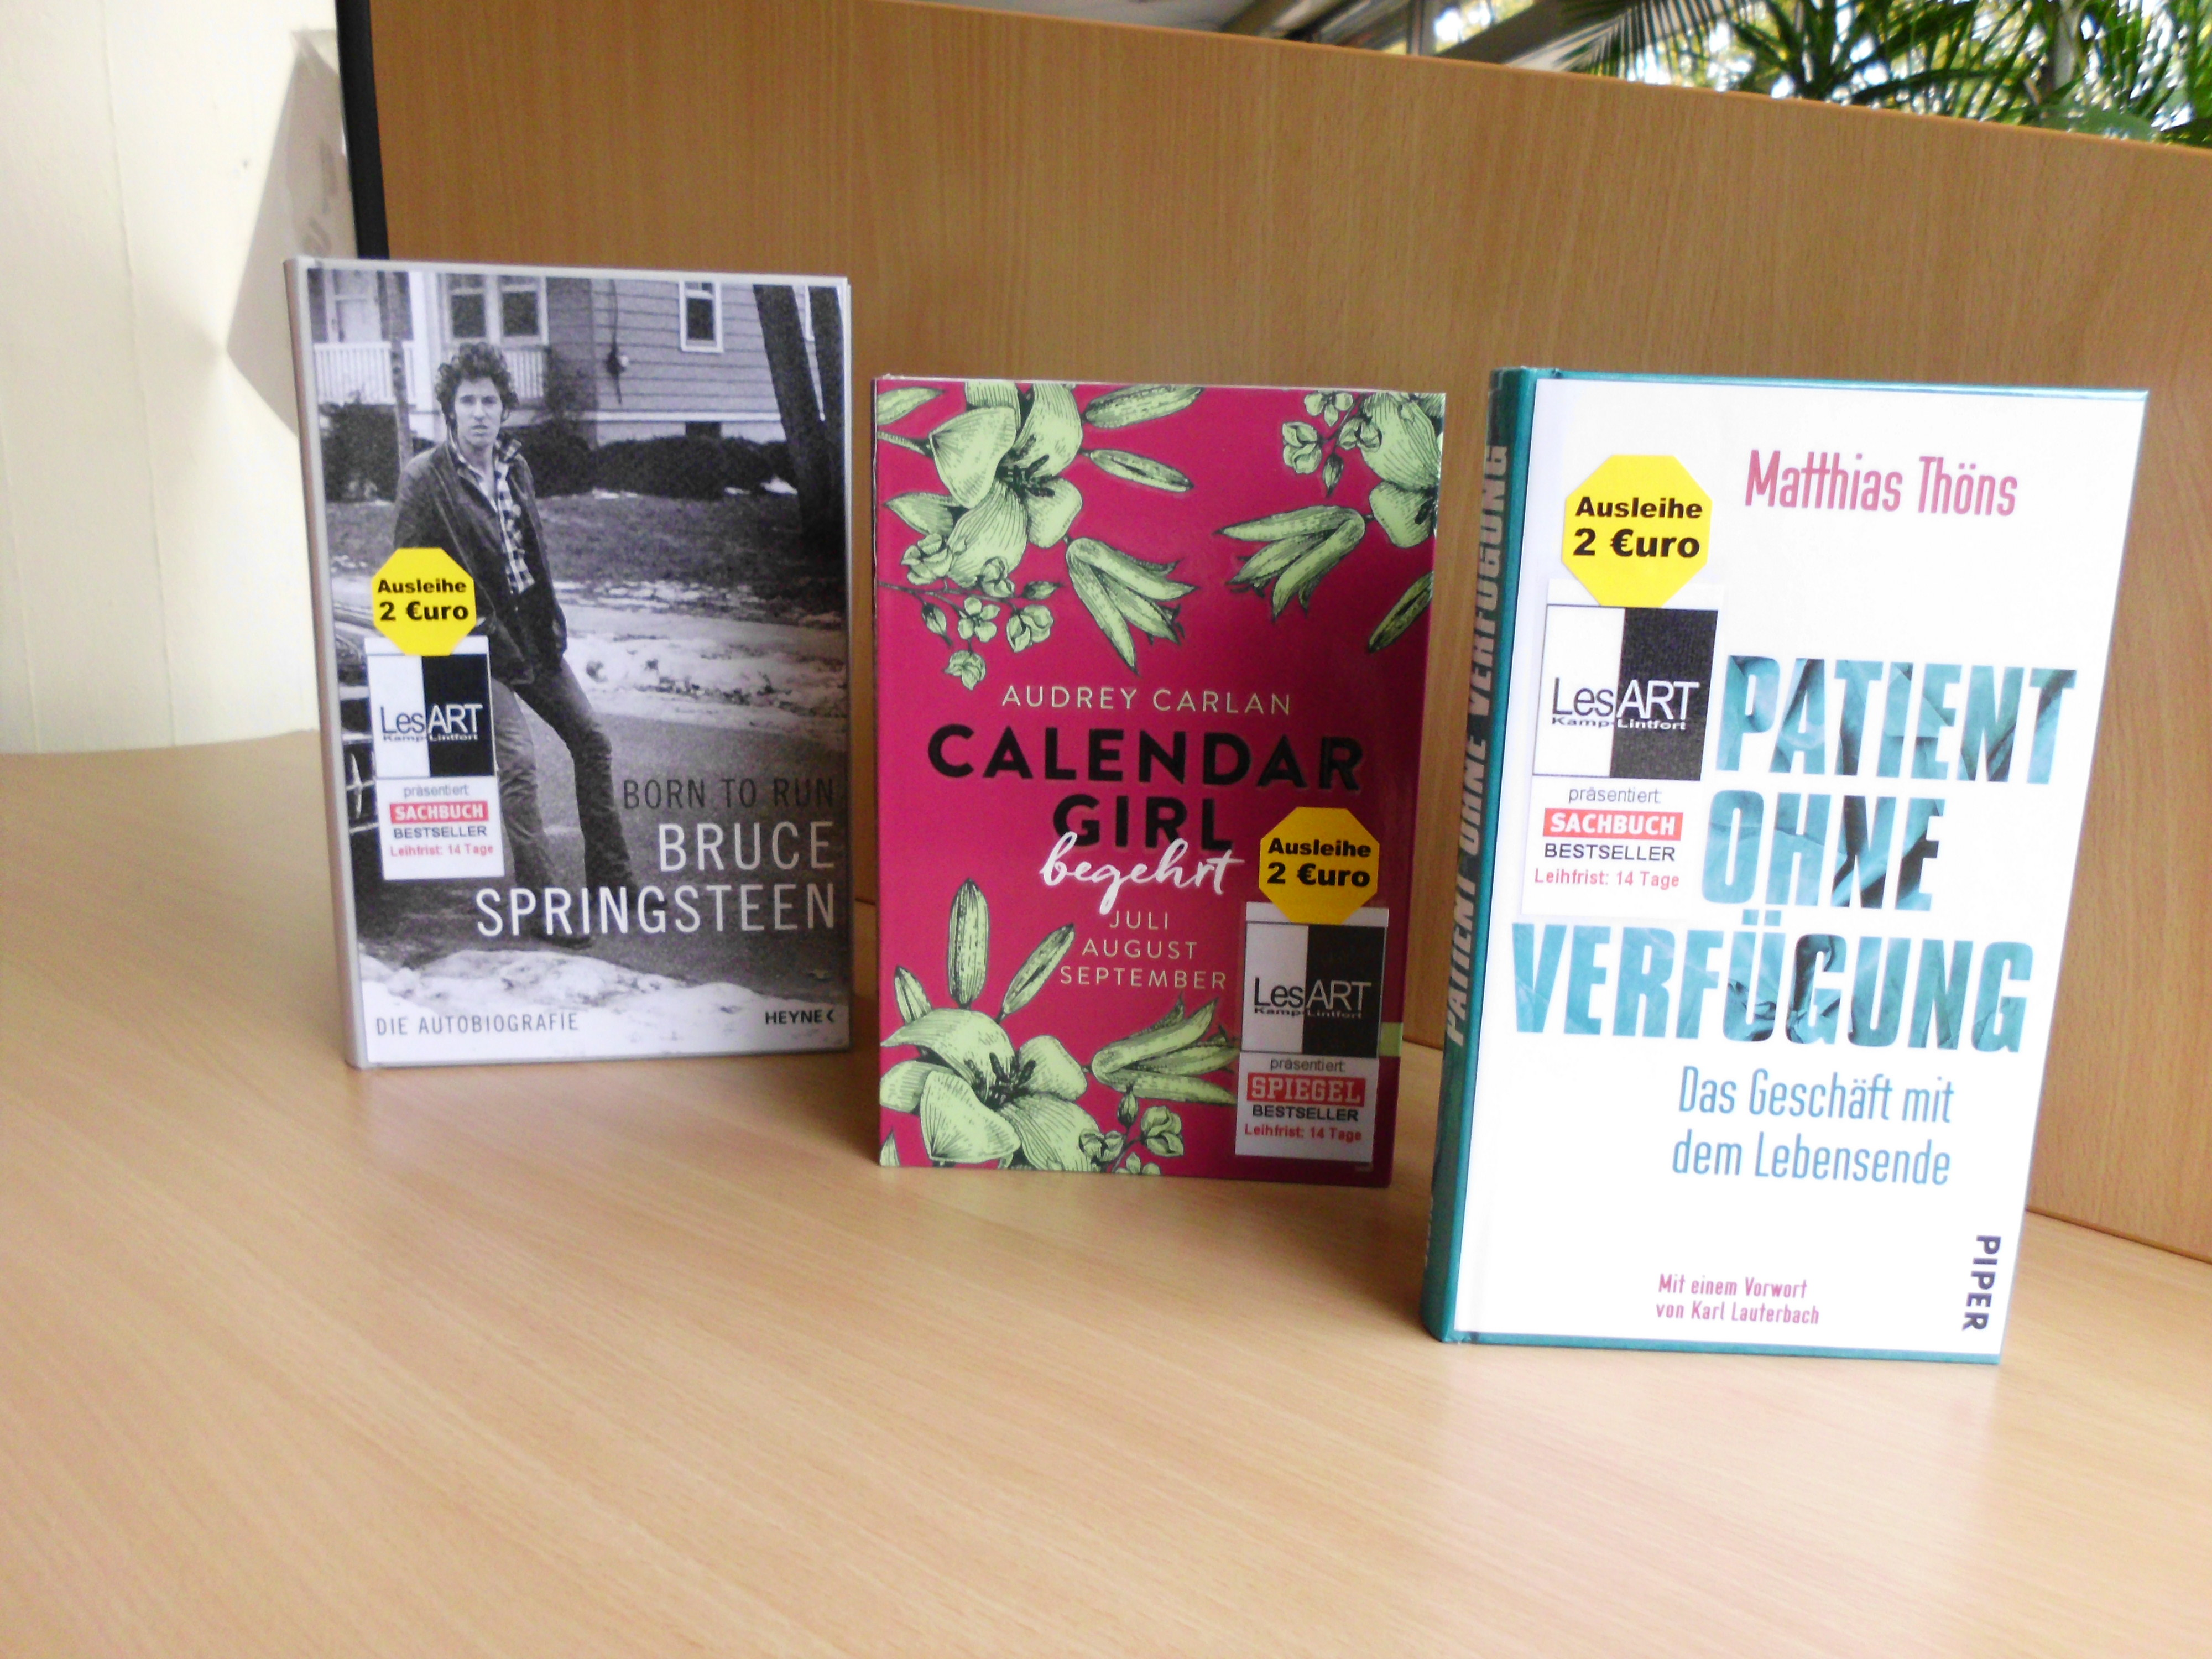 Bestseller Springsteen, Thöns, Carlan